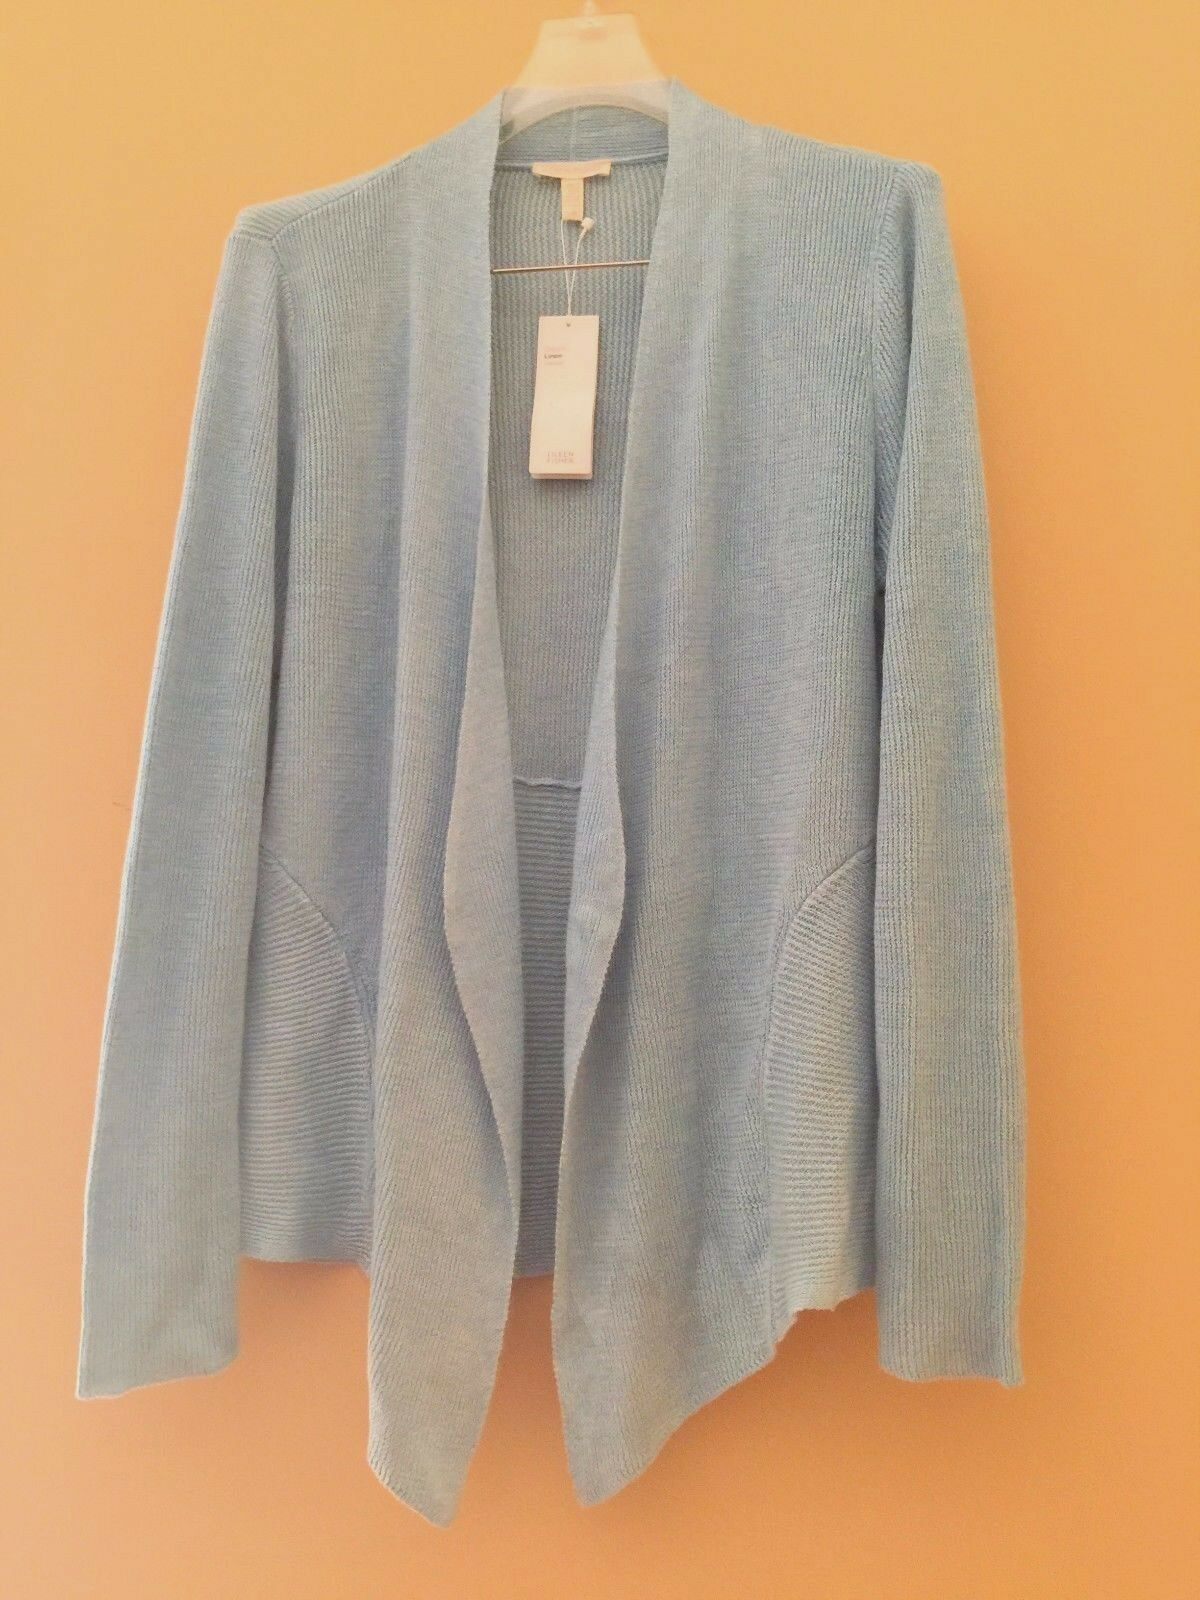 Eileen Fisher Windflower Windflower Windflower bluee Organic Linen Angled-Front Cardigan S a1ebf4